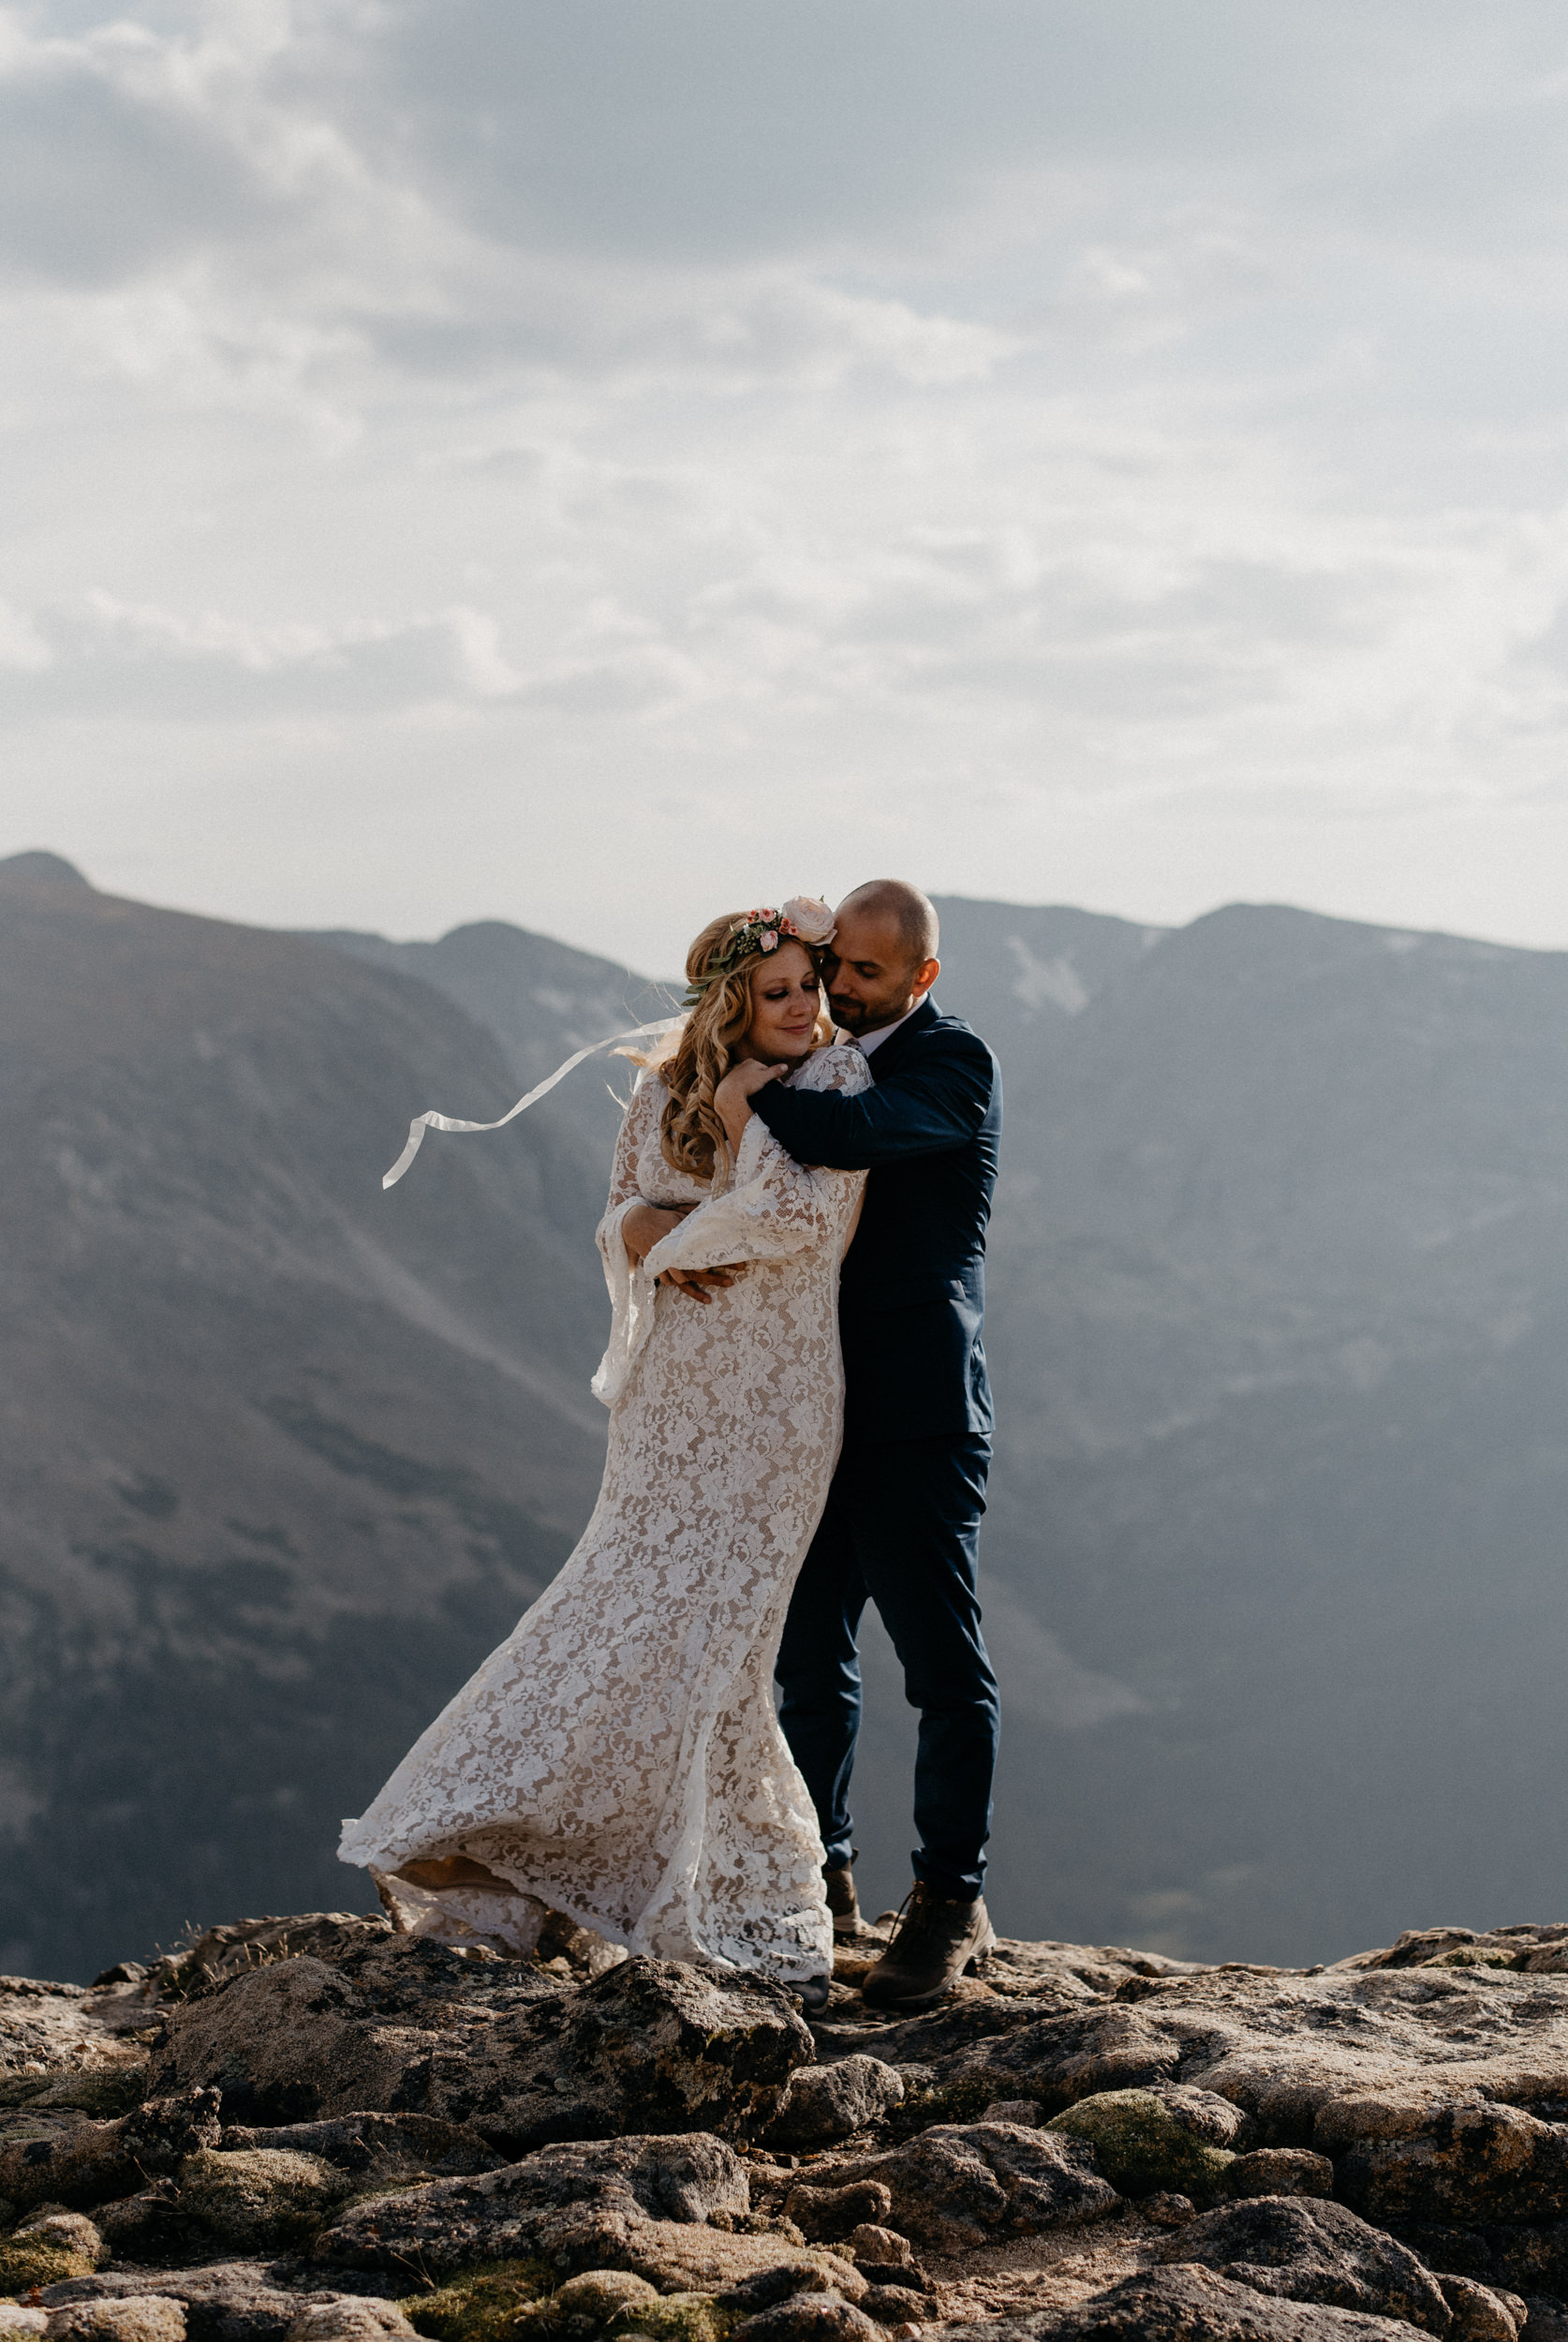 RMNP elopement at Trail Ridge Road. Colorado wedding photographer.